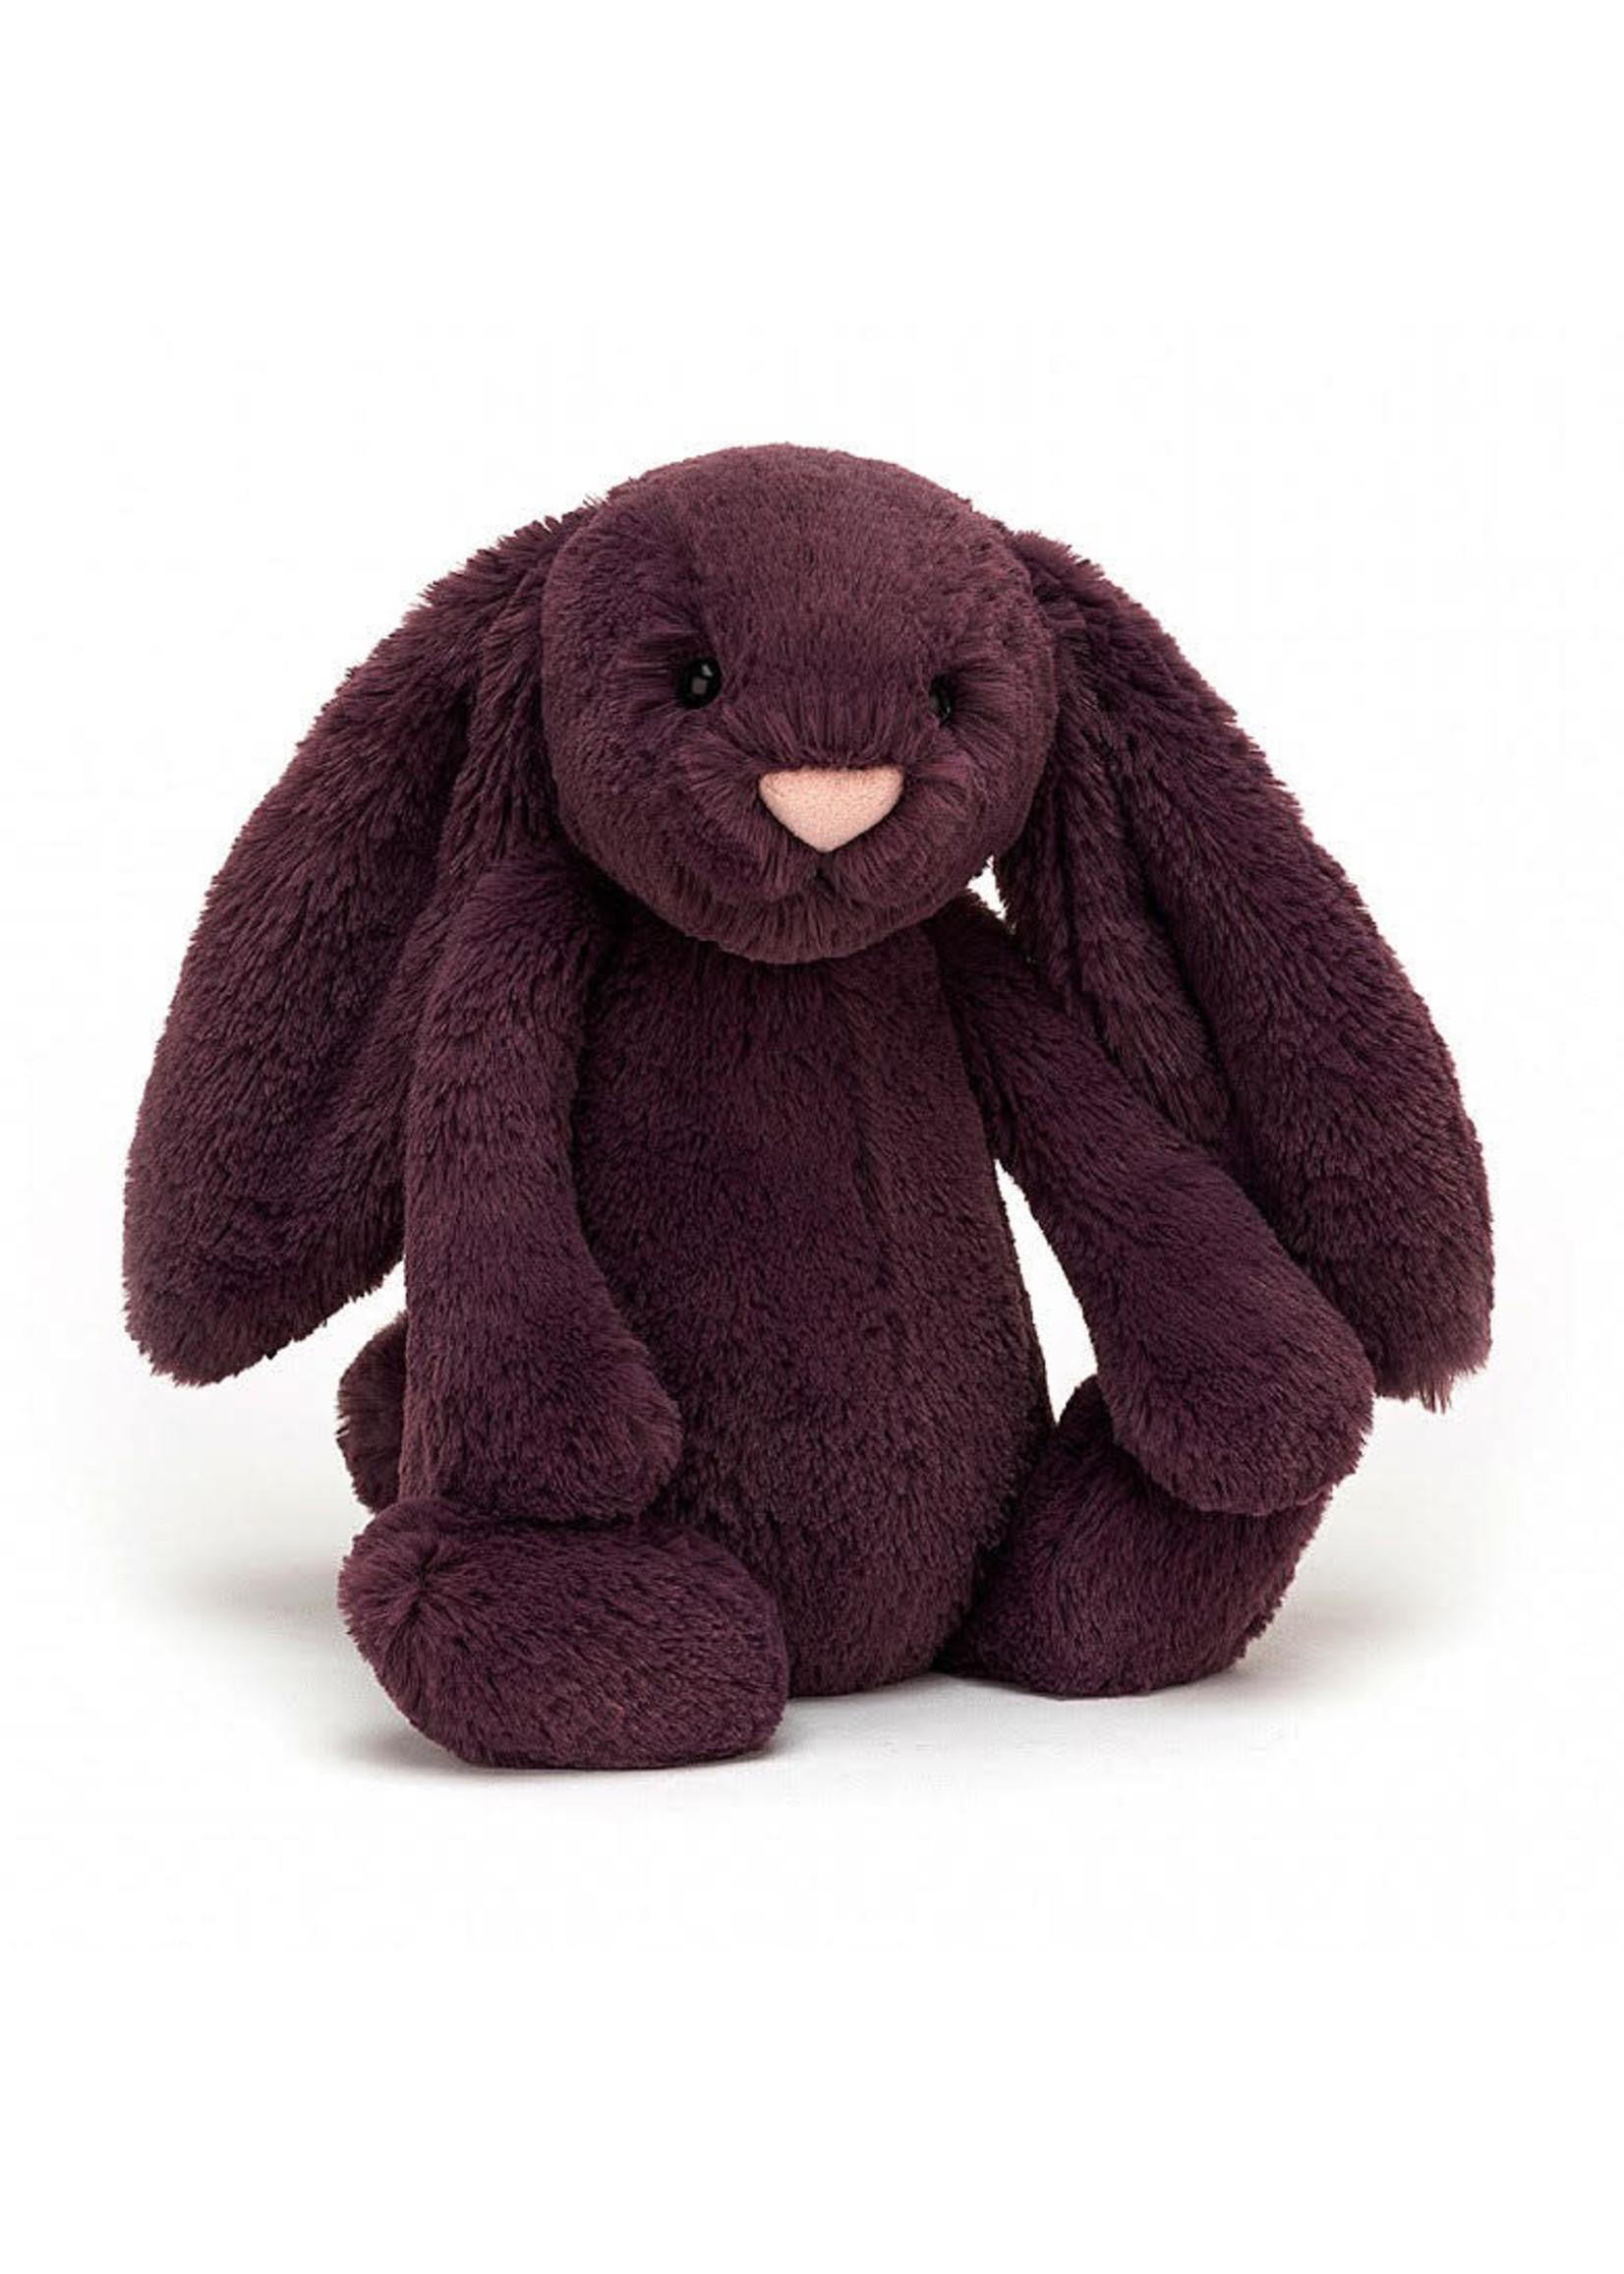 Jellycat JC Medium Bashful Plum Bunny